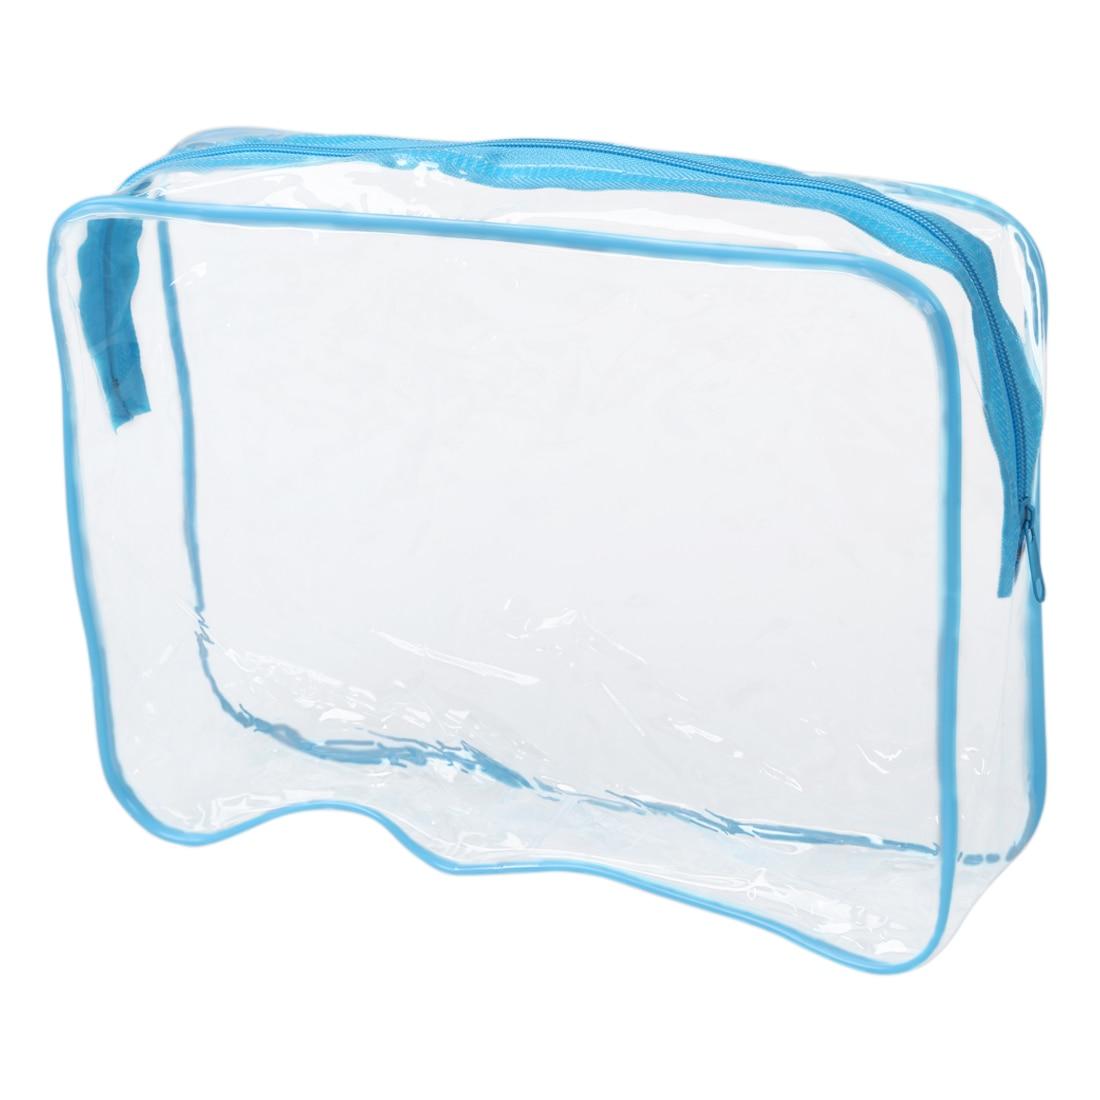 PVC Clear Pouch Travel Bathing Toiletry Zipper Cosmetic Bag, Blue L